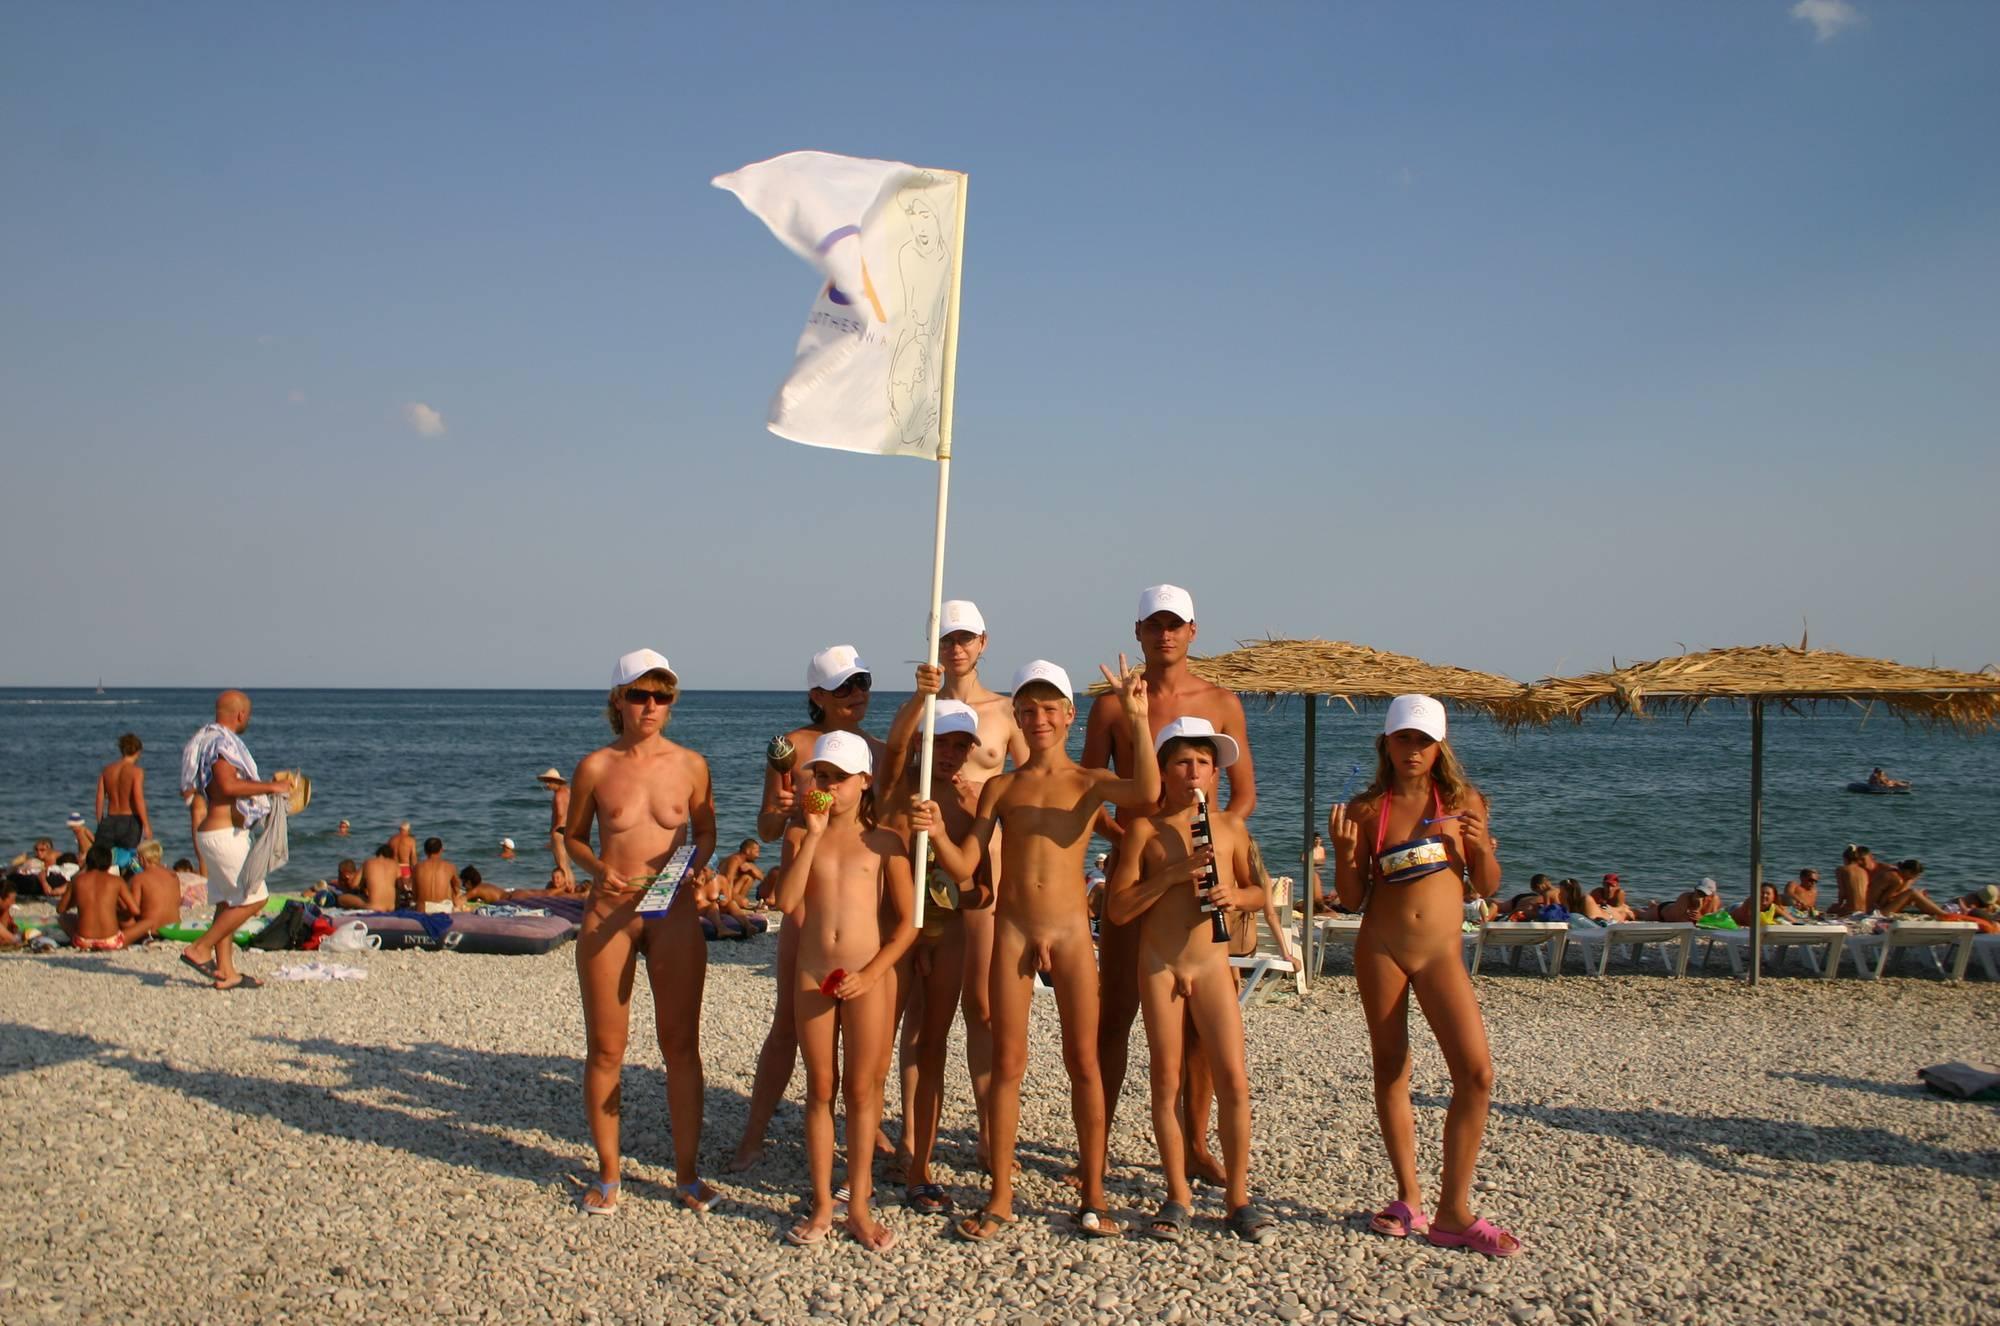 Nudist Family Flag Parade - 3